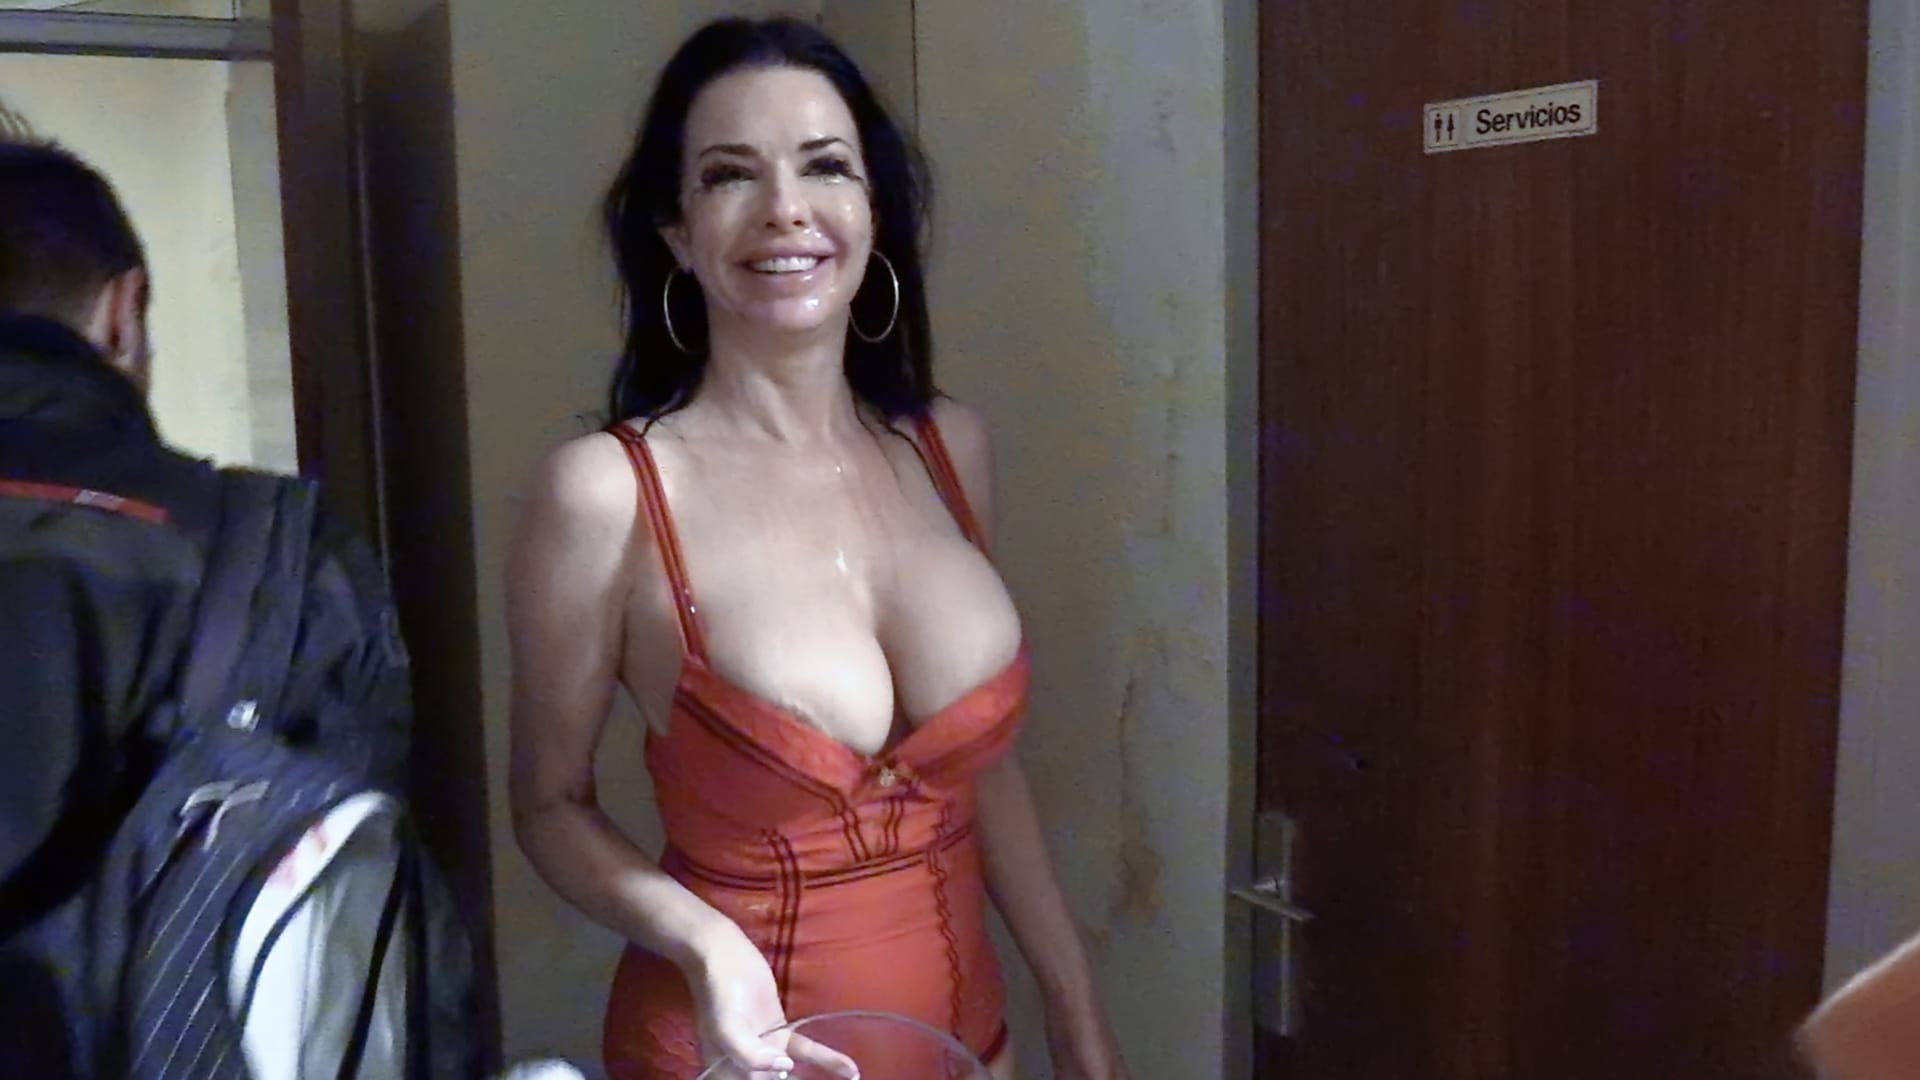 Midget and chick porn